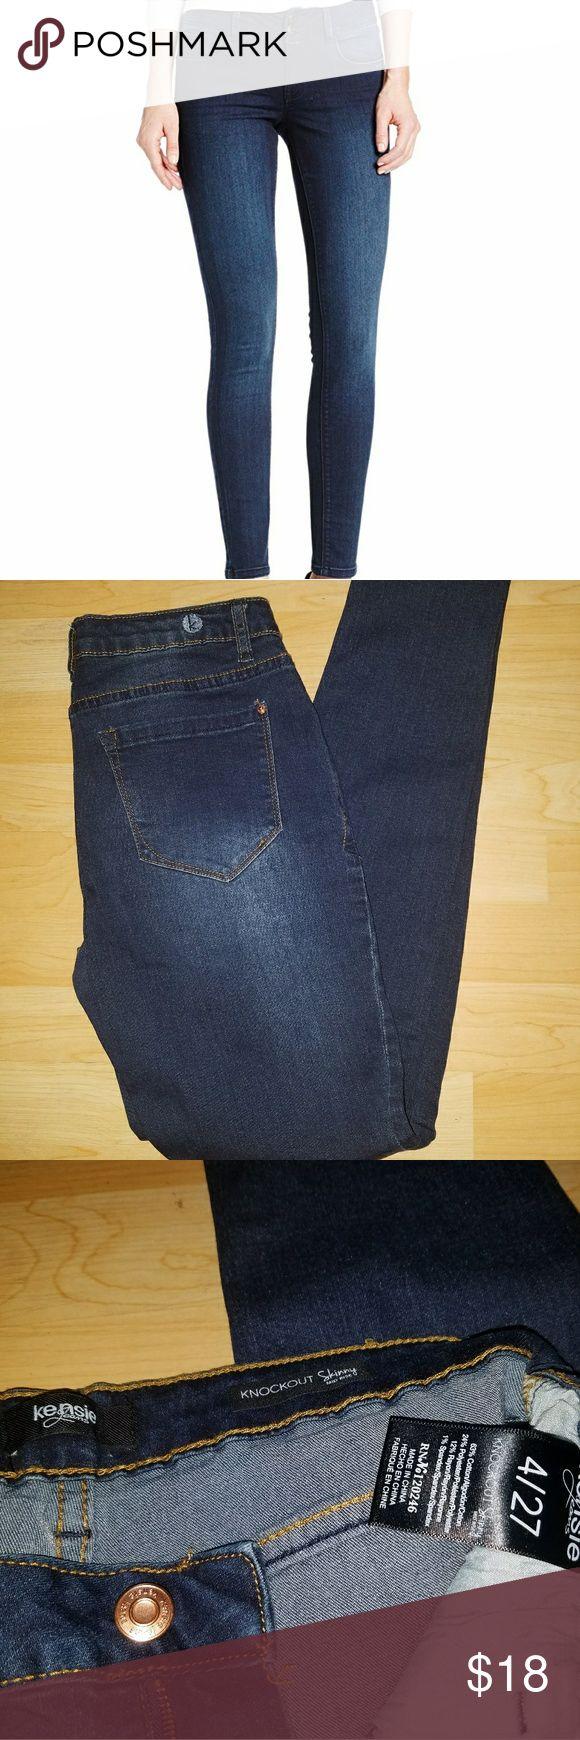 Kensie  Knockout Skinny Jeans 27 Super flattering midrise skinny jean; Size 27/4; great condition Kensie Jeans Skinny